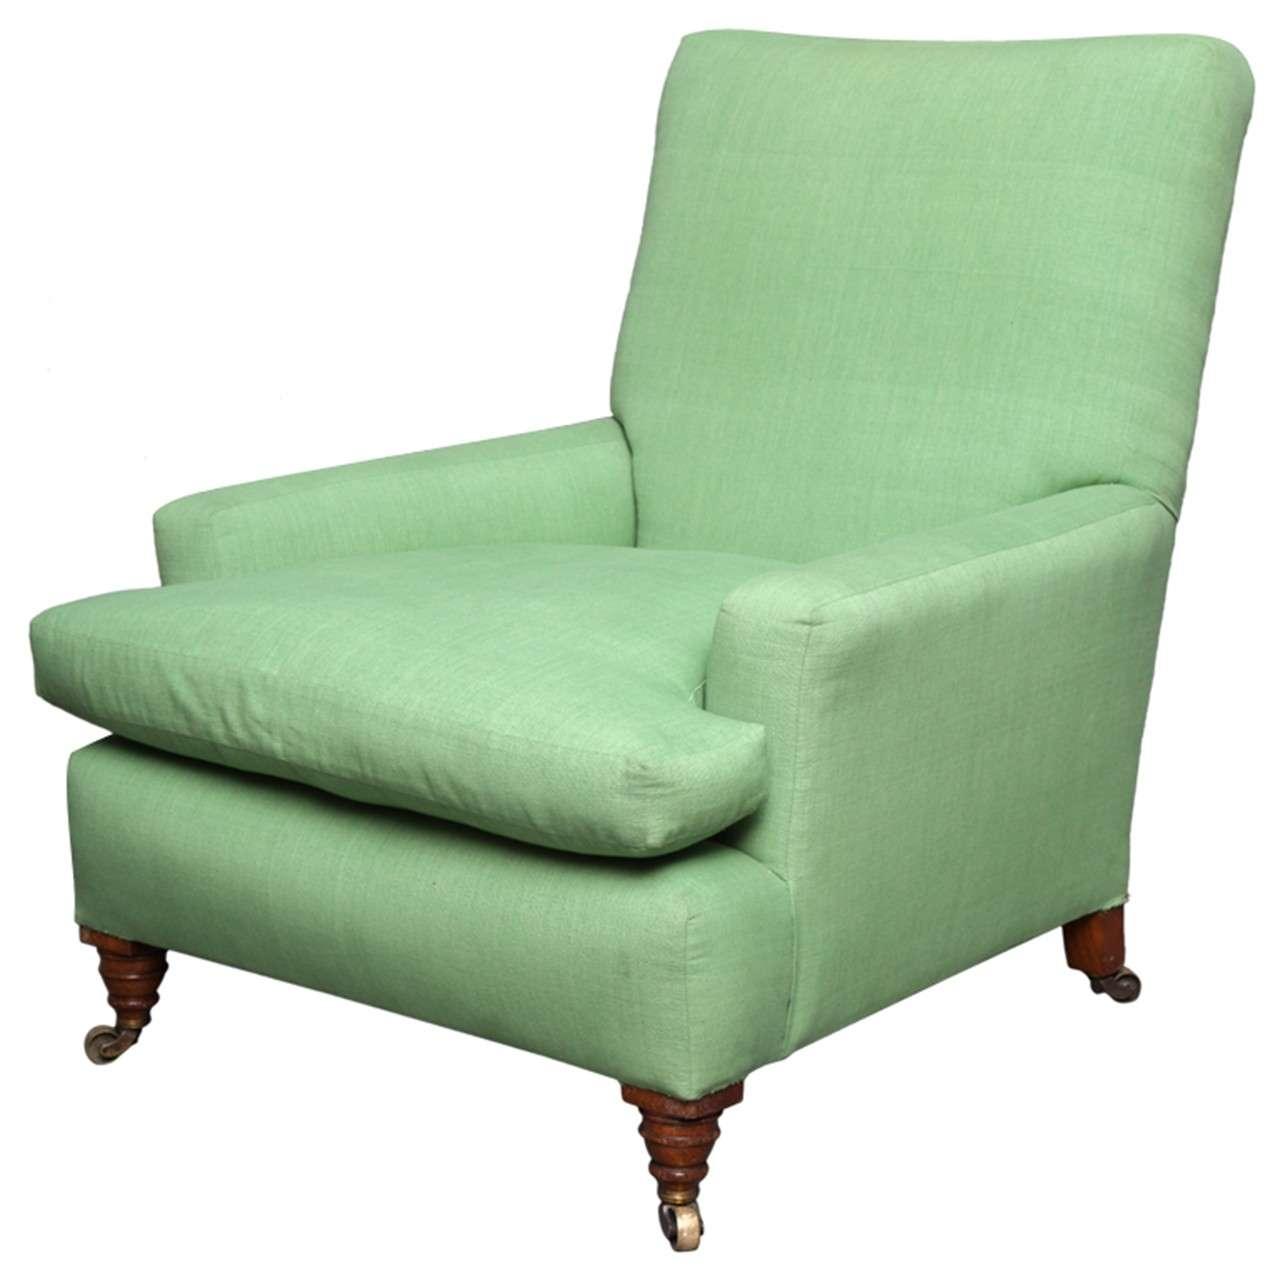 English Club Chair in Green Linen 1